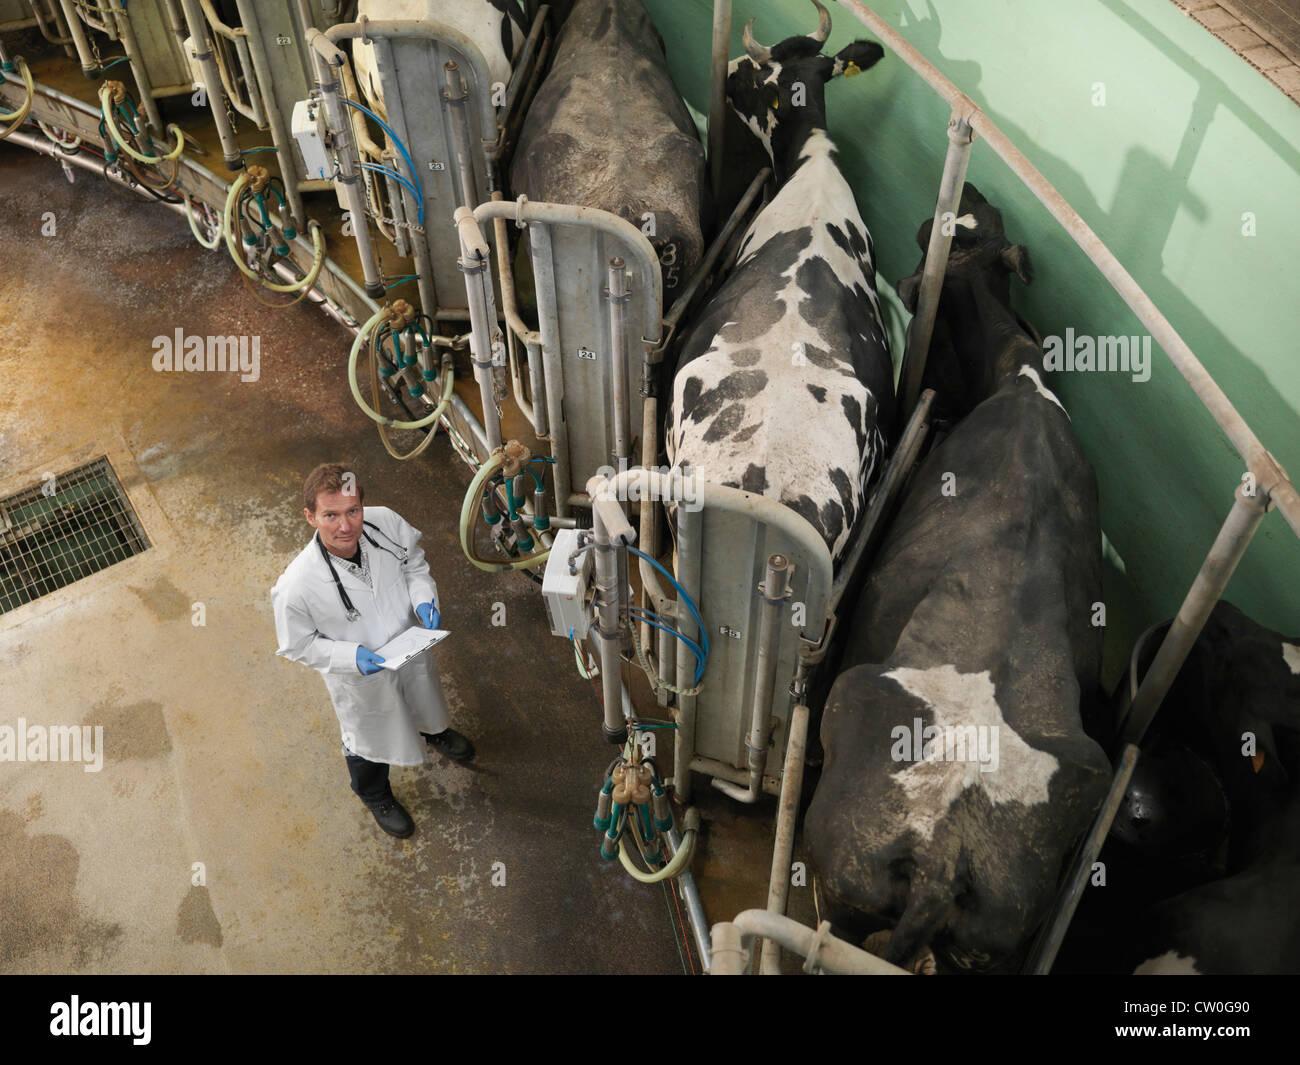 Veterinarian working in milking parlor - Stock Image